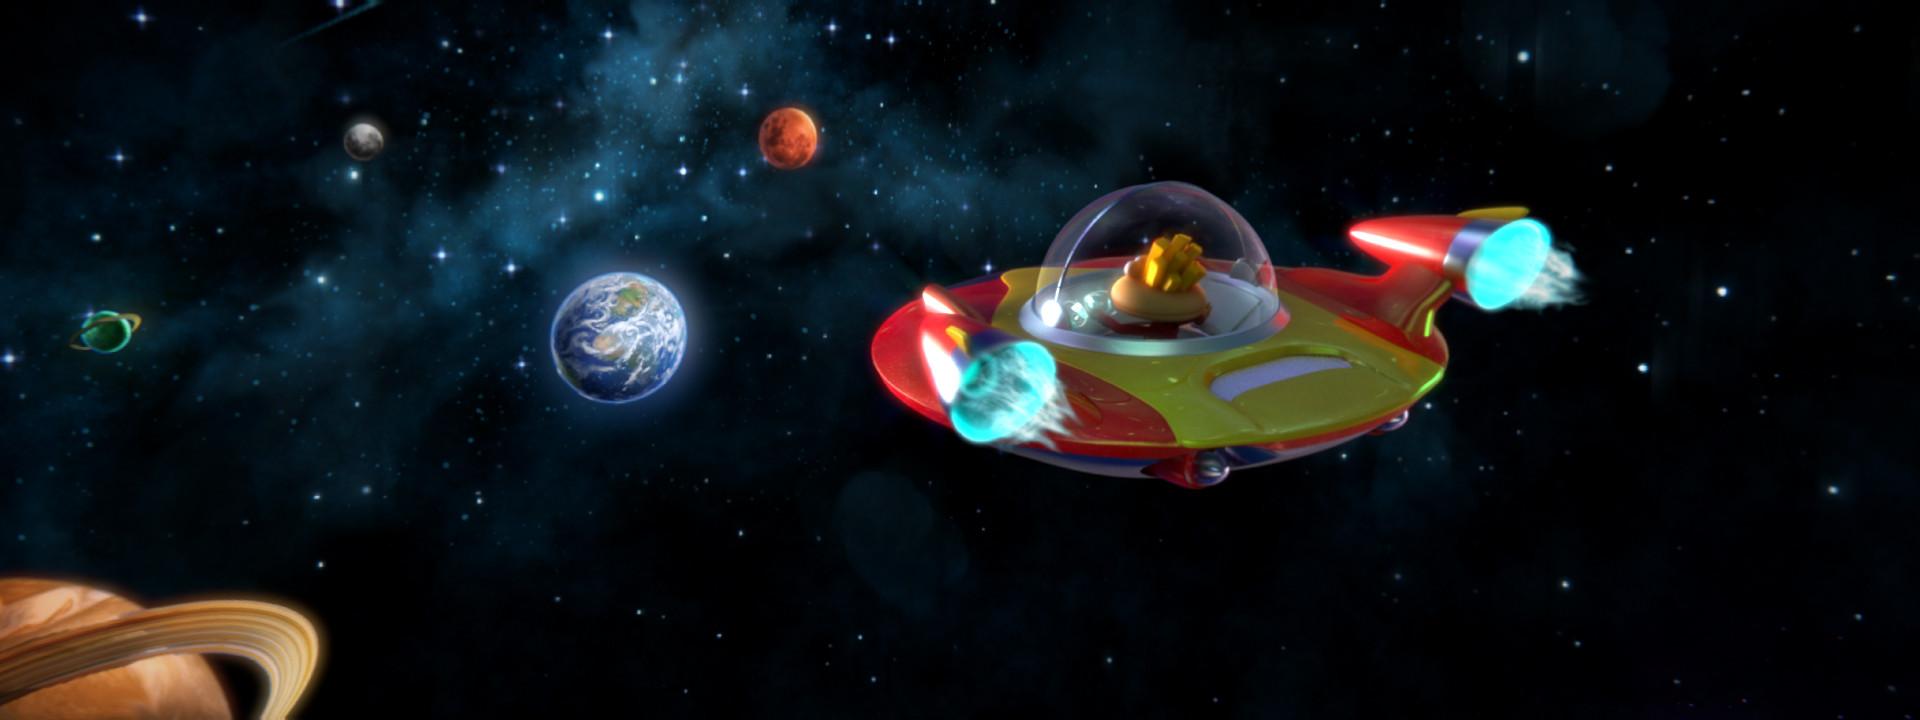 Basile arquis basile arquis flying saucer 06